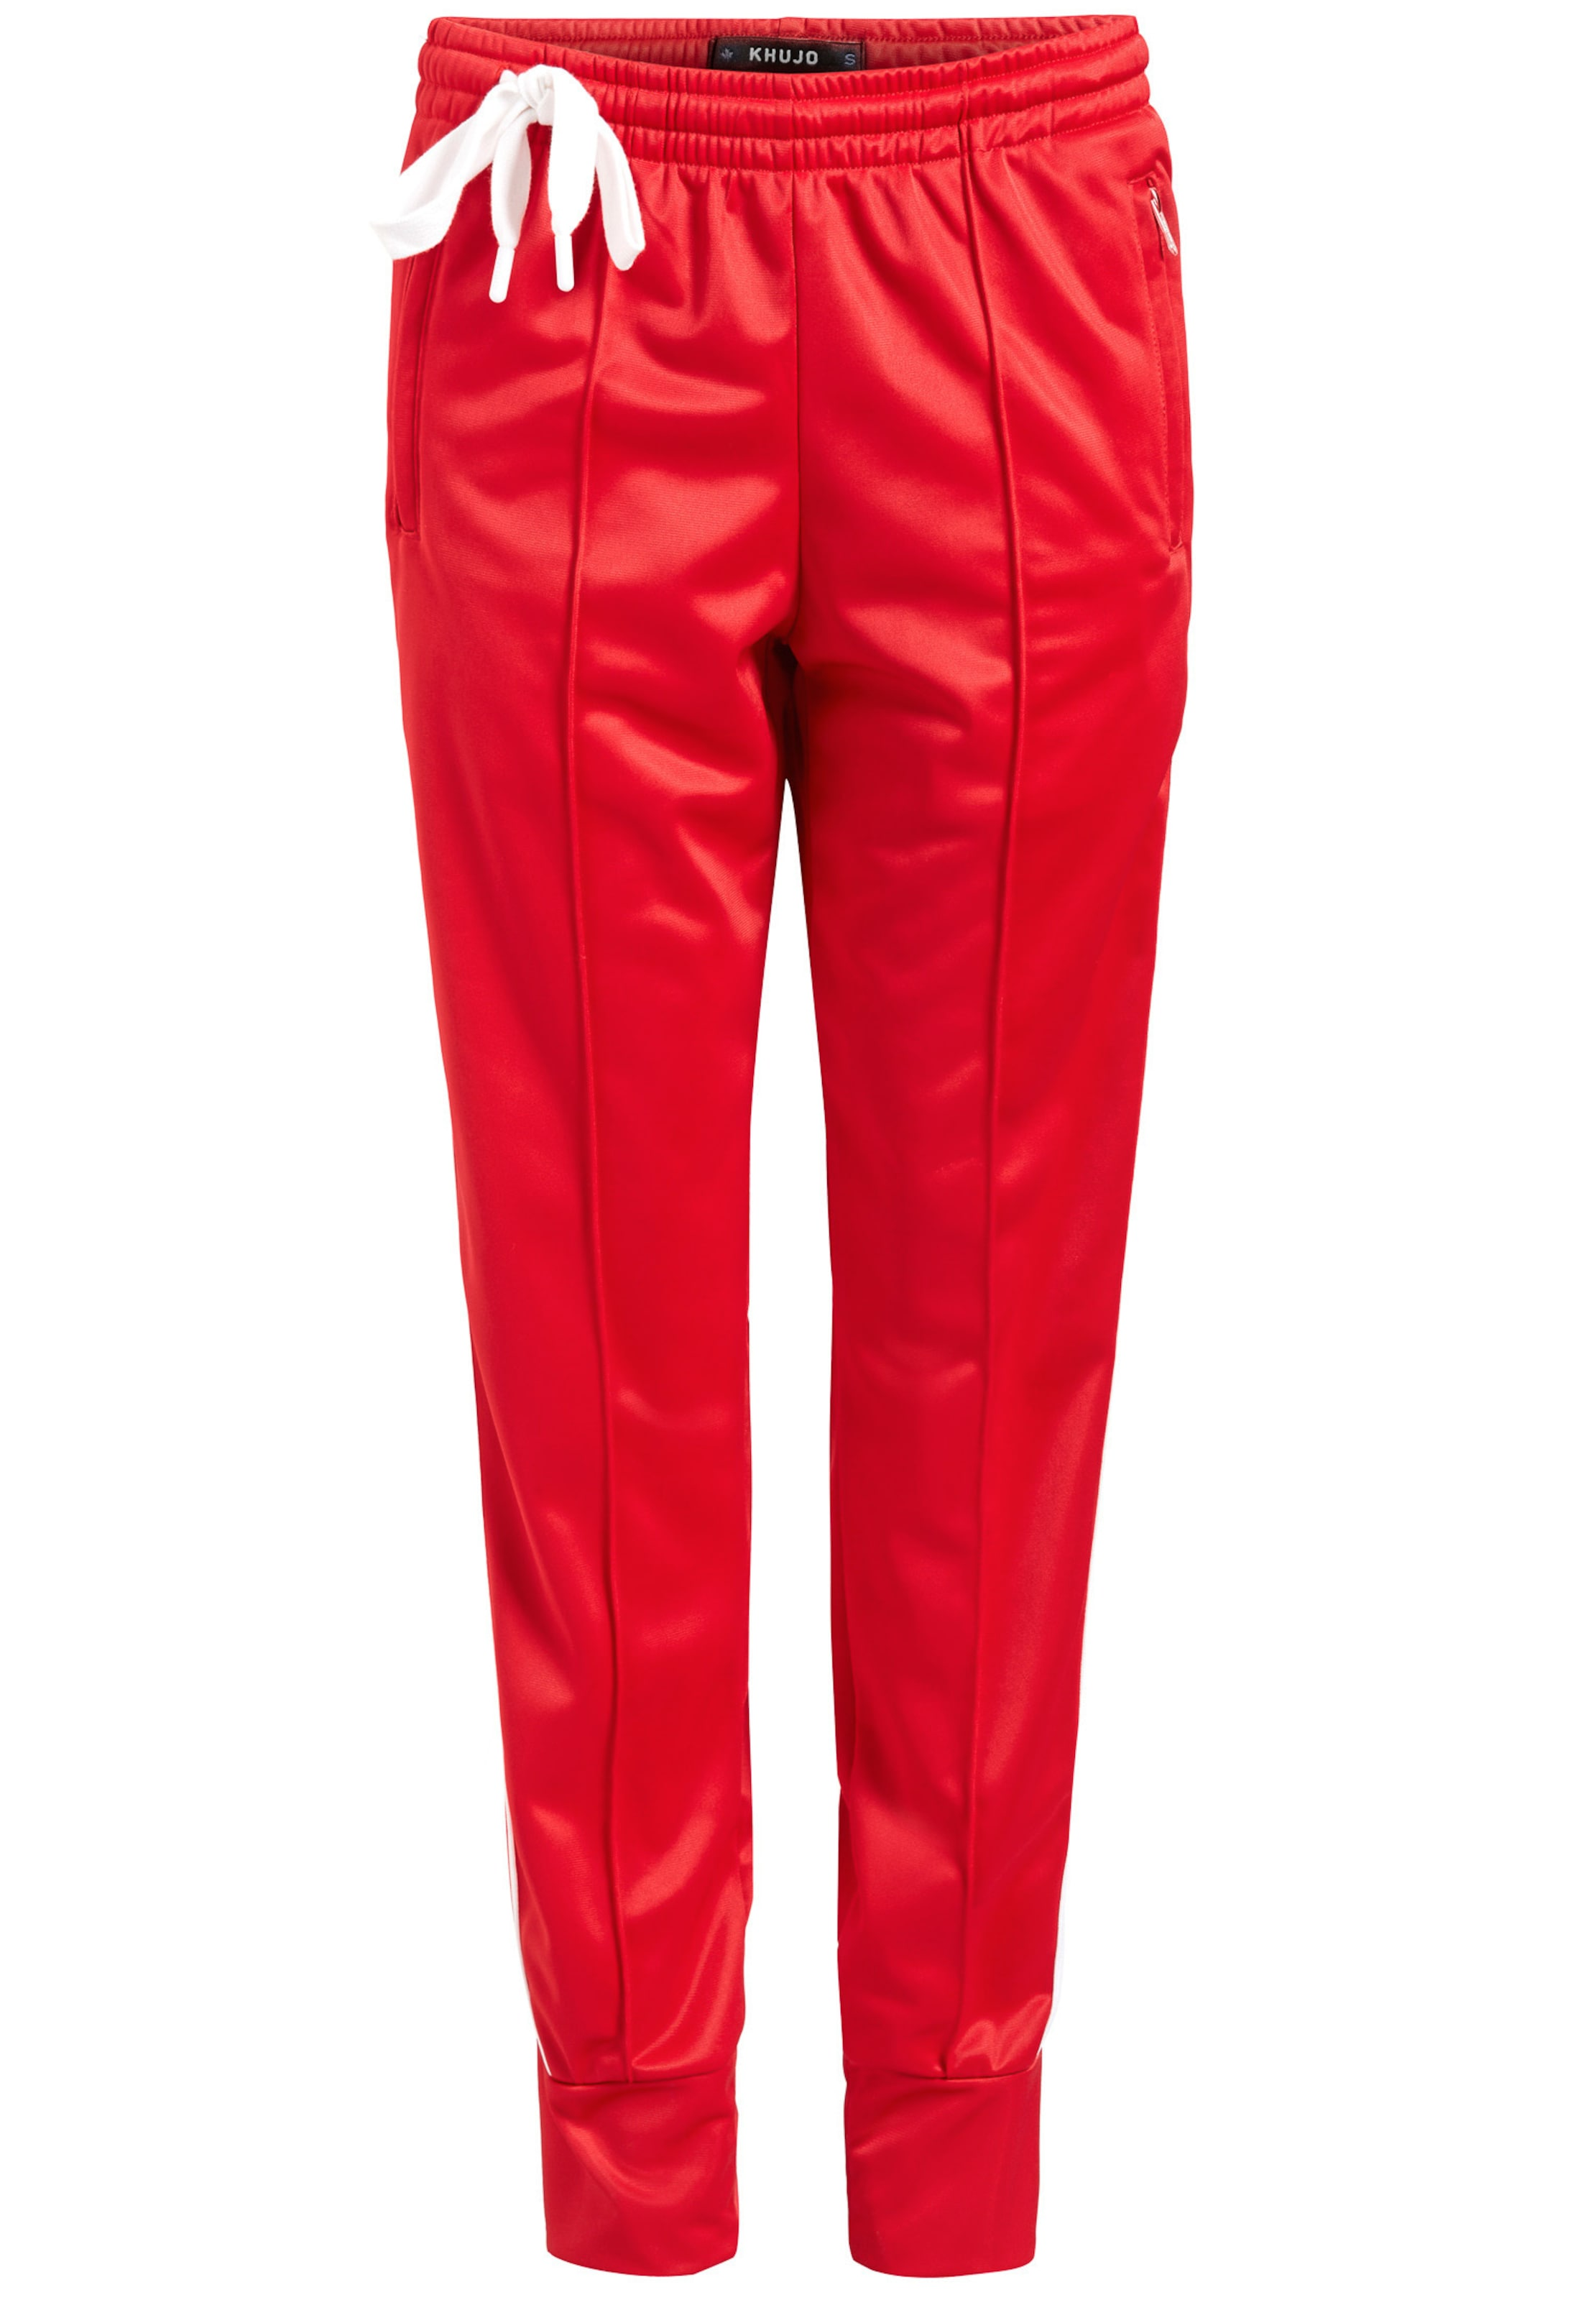 Pantalon En En Rouge 'maile' Pantalon En Rouge Khujo Pantalon Khujo Khujo 'maile' 'maile' hQsrtd